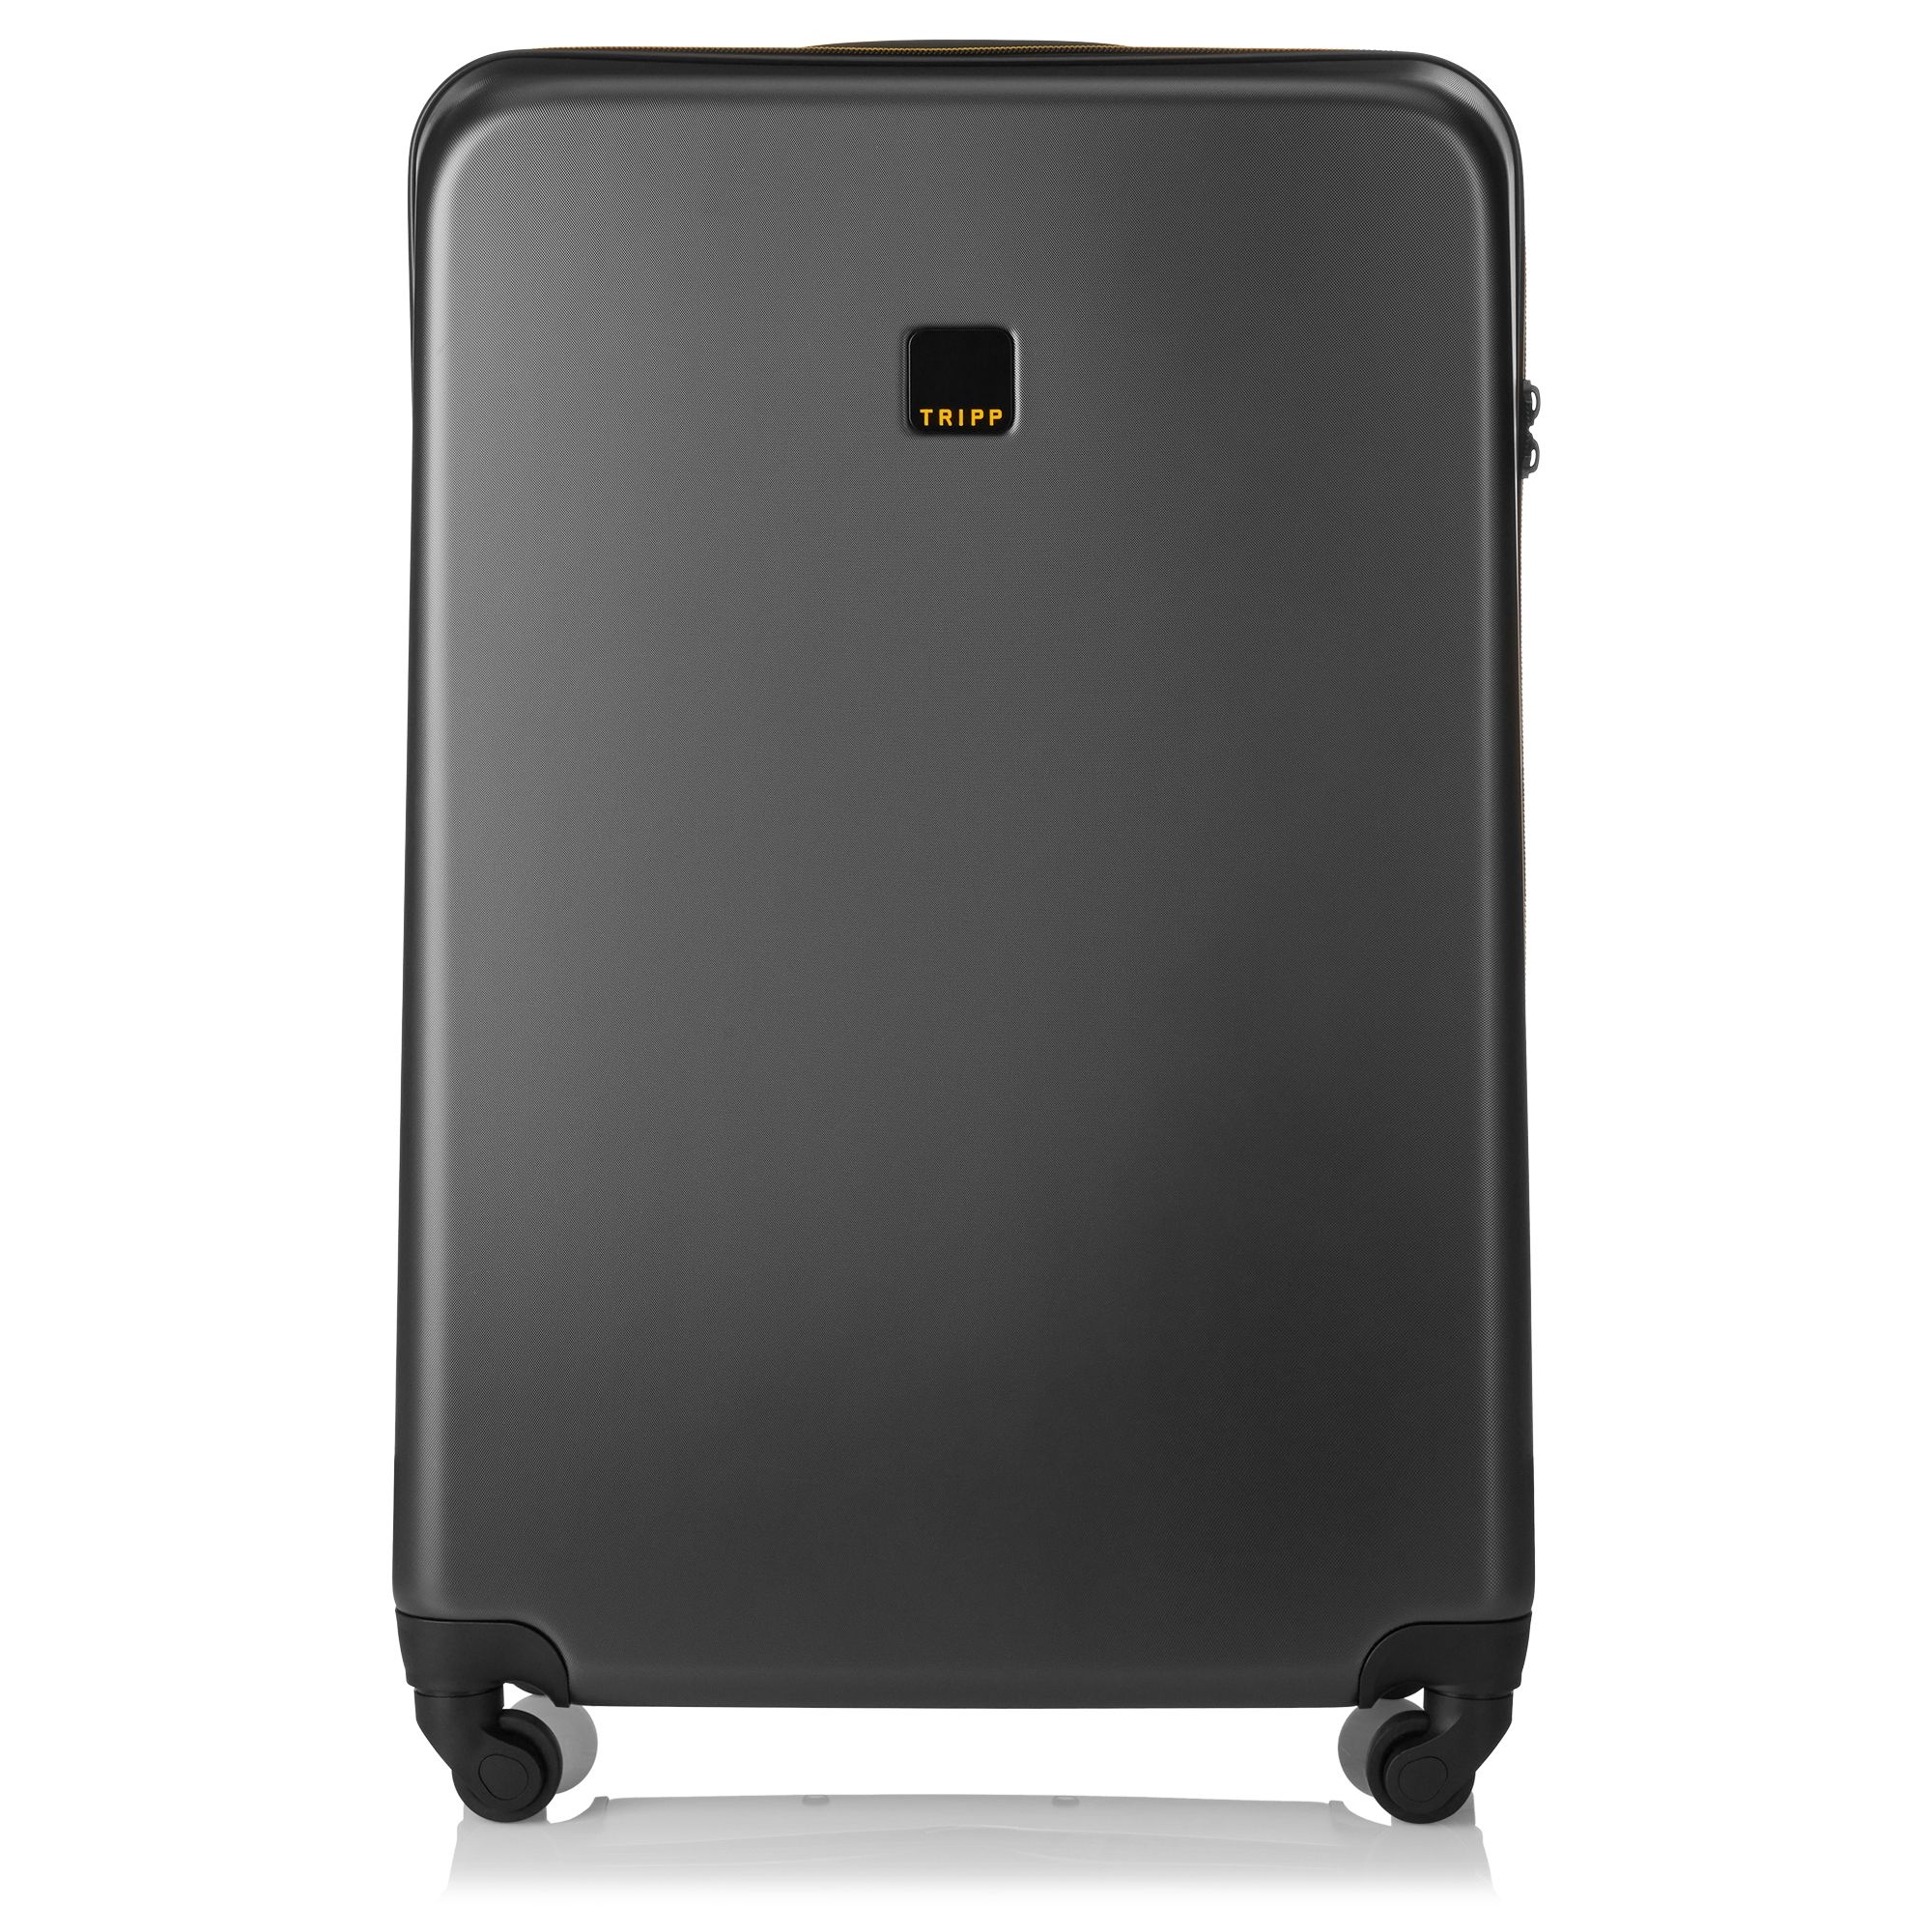 tripp graphite 39 style lite hard 39 large 4w case hard. Black Bedroom Furniture Sets. Home Design Ideas